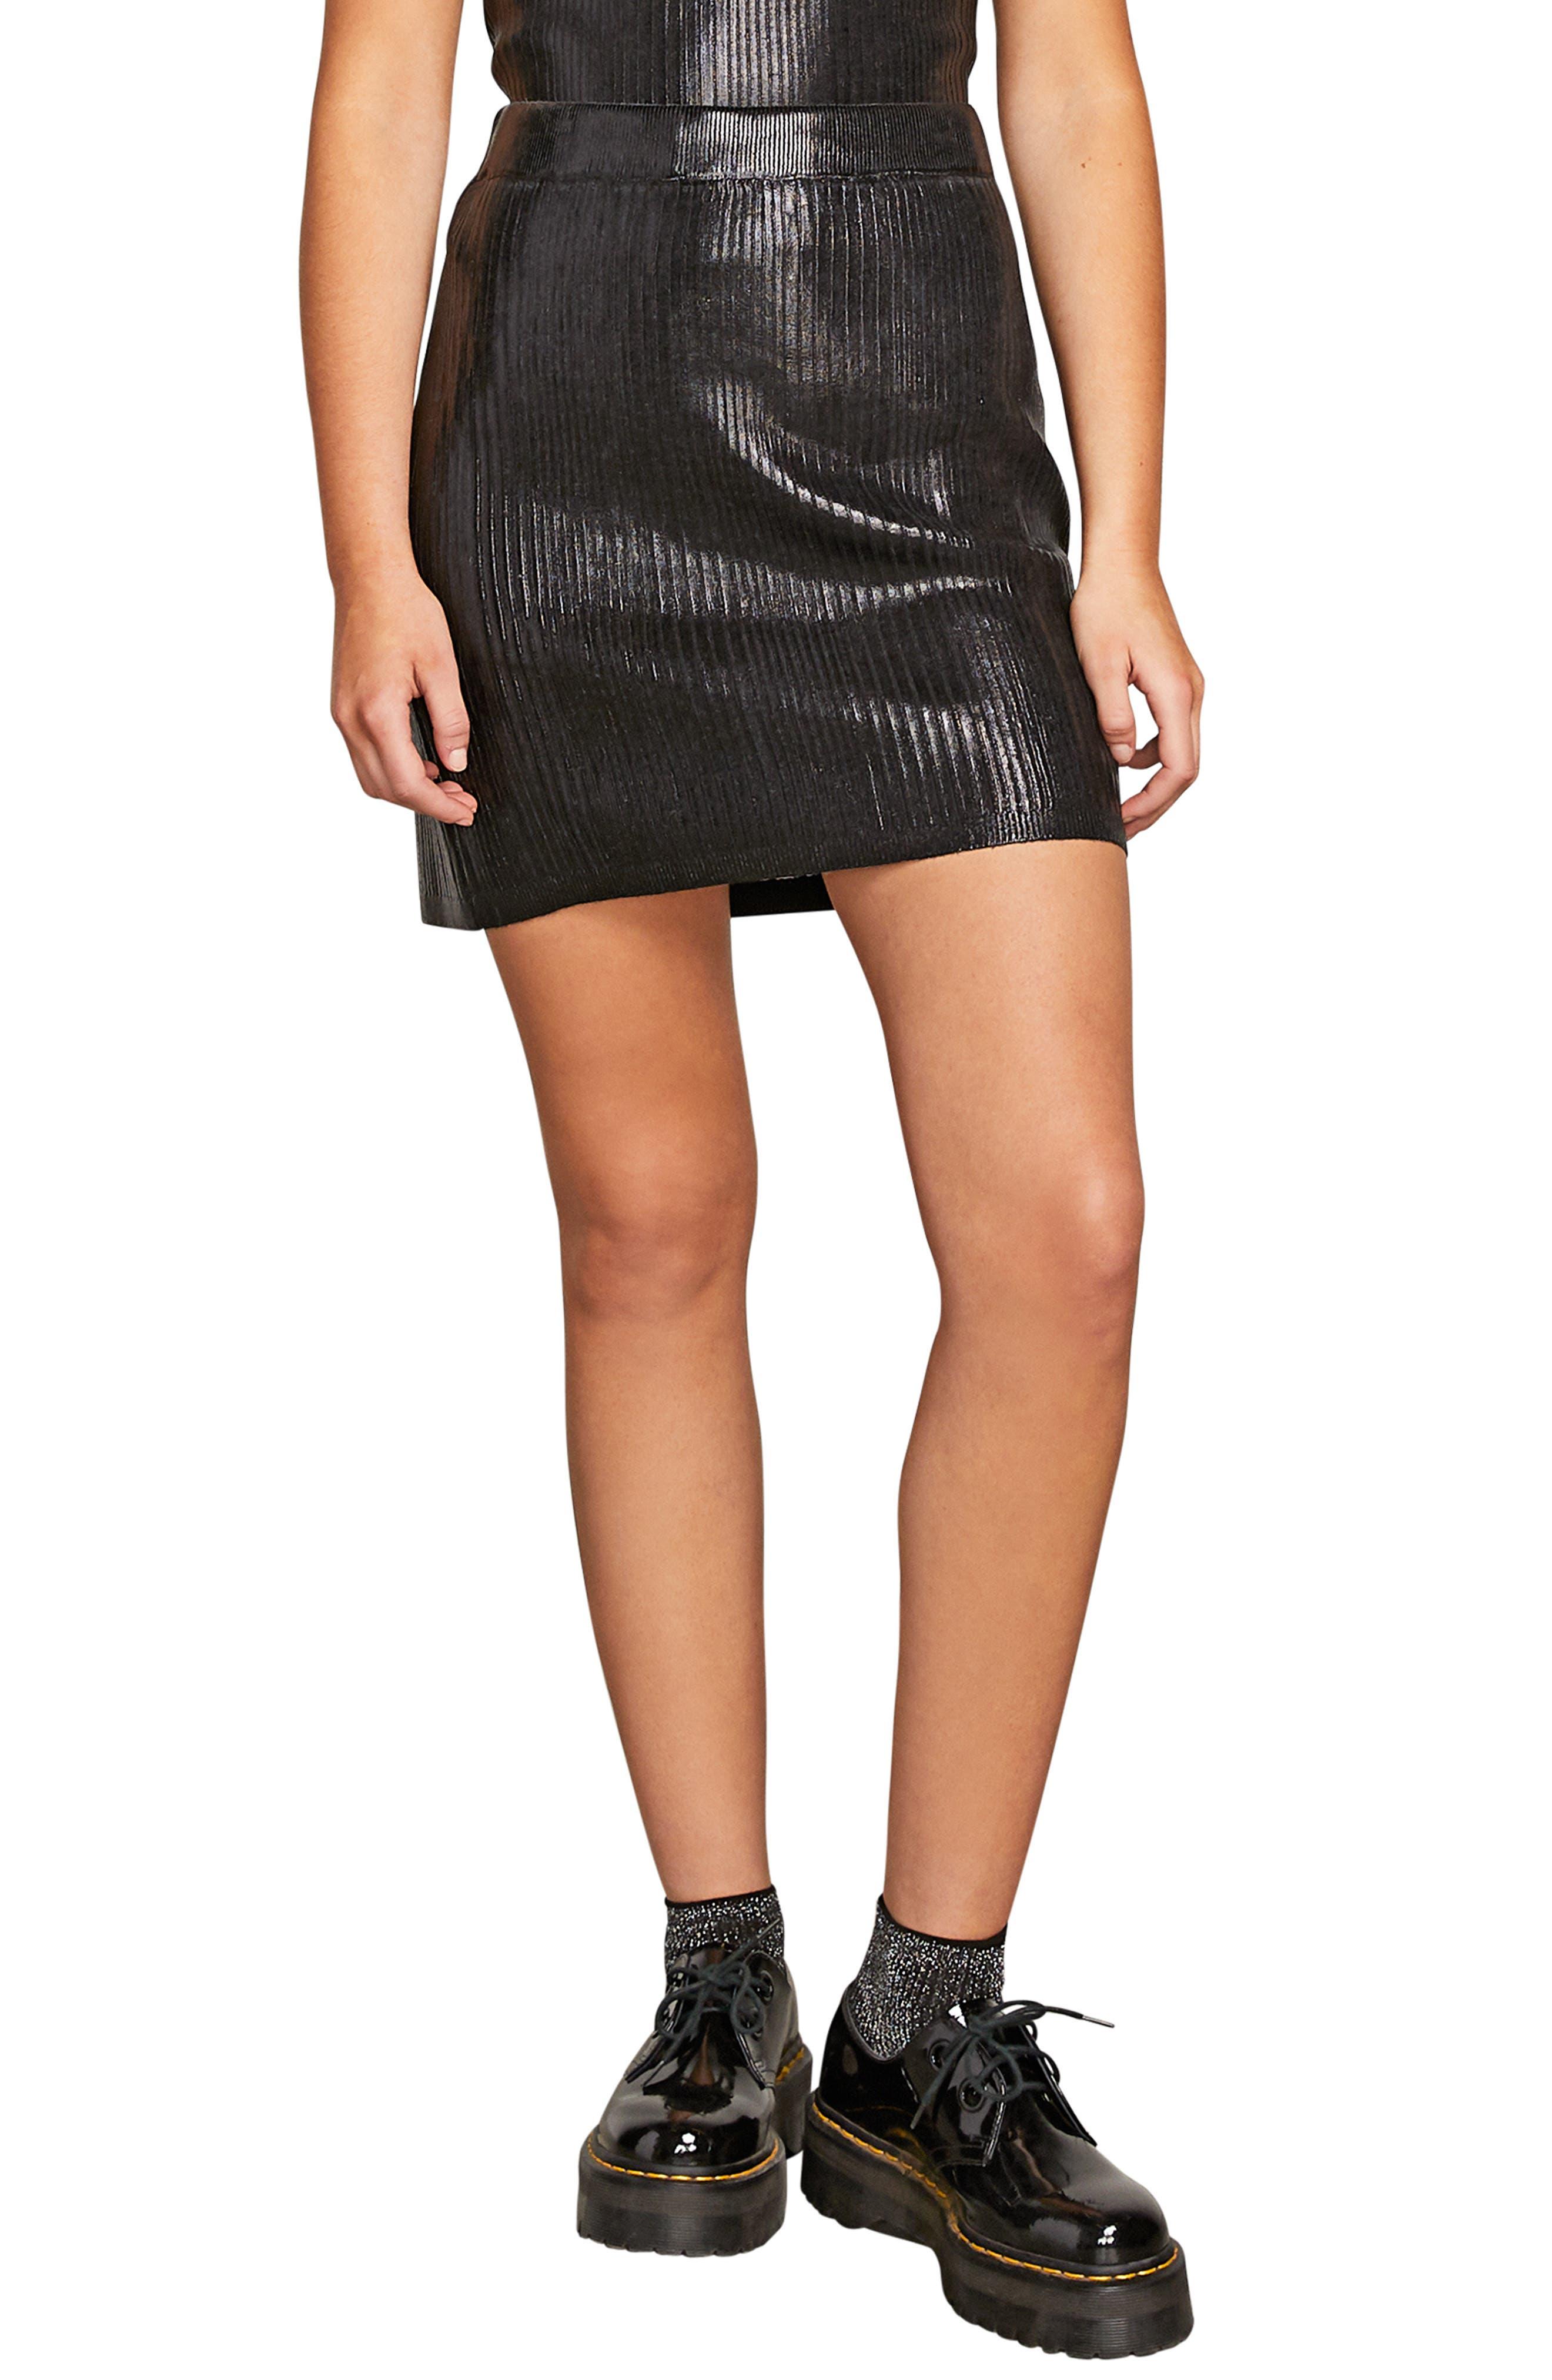 Volcom Hey Slick Ribbed Miniskirt, Black